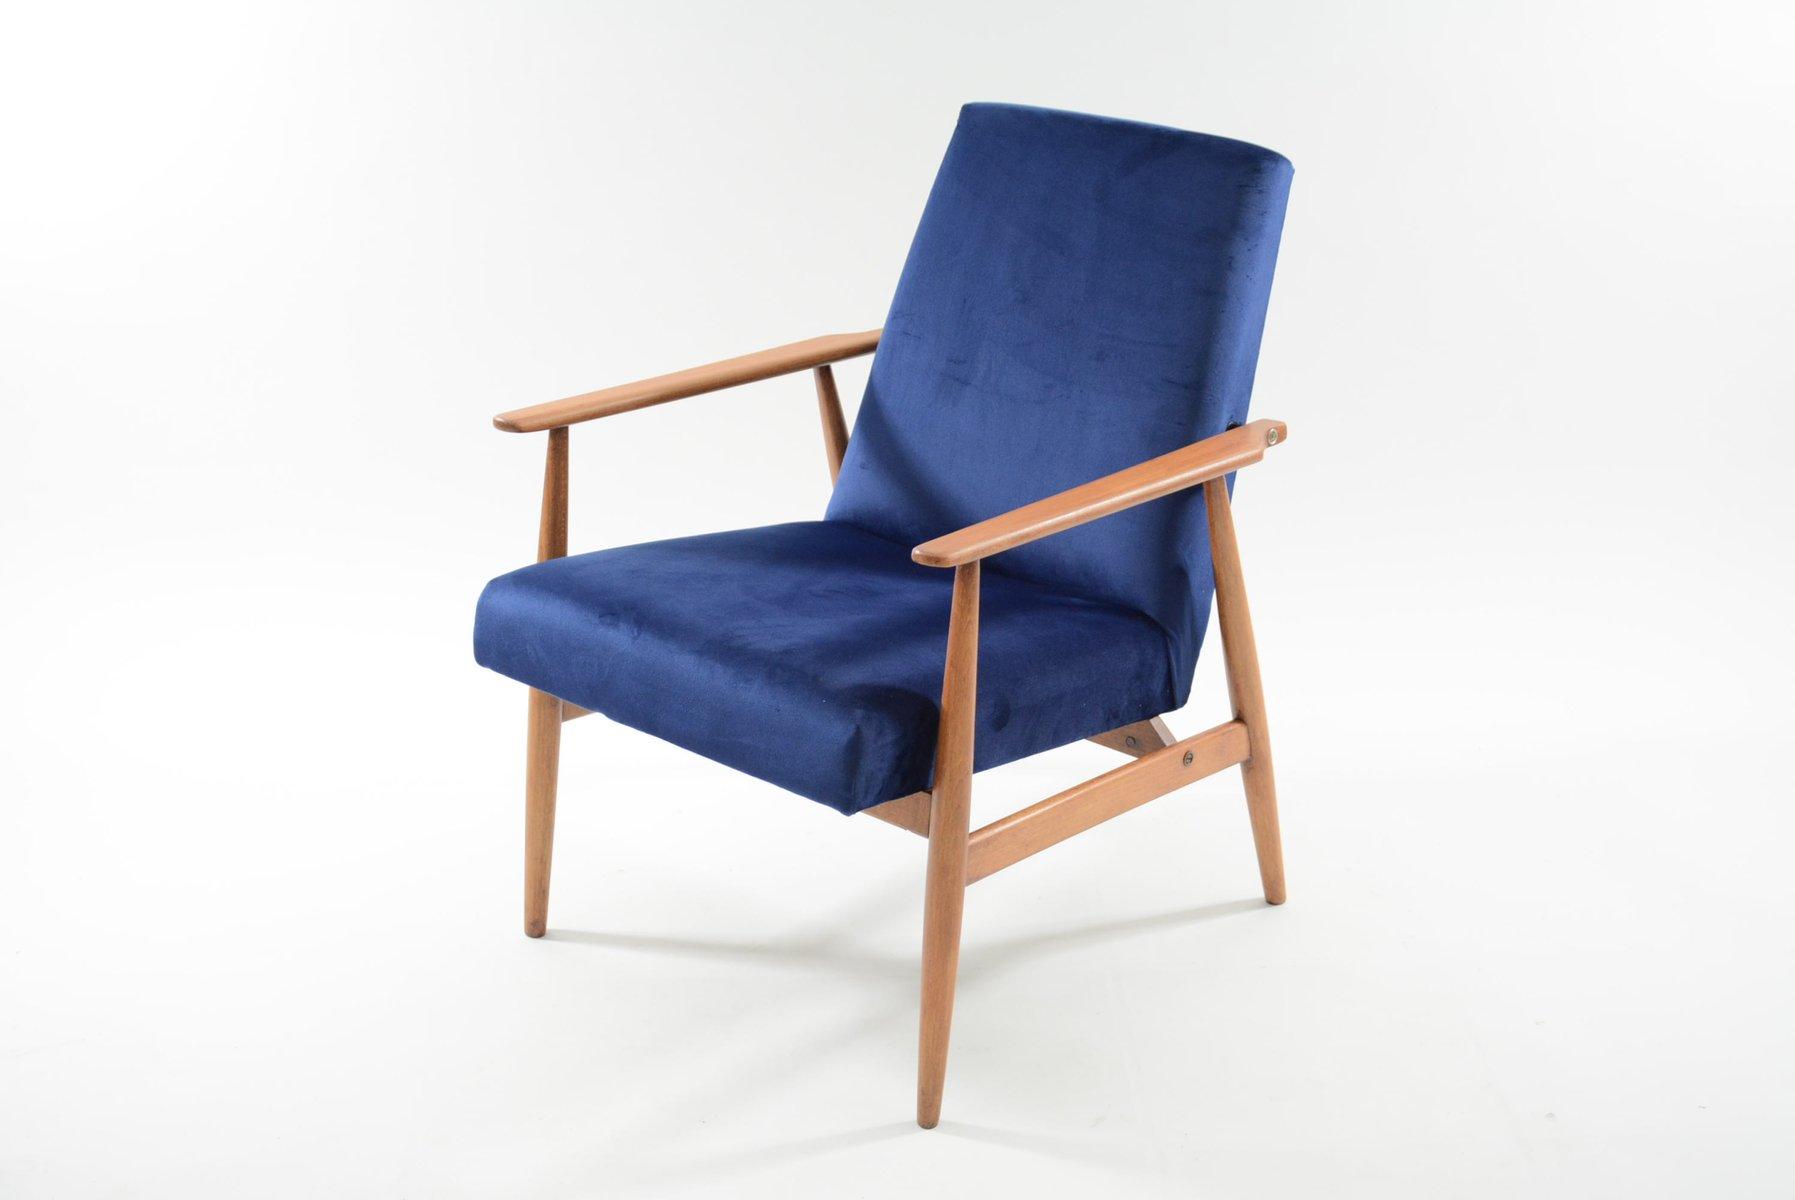 Modell Fox Sessel in königsblauem Samt von H. Lis, 1960er